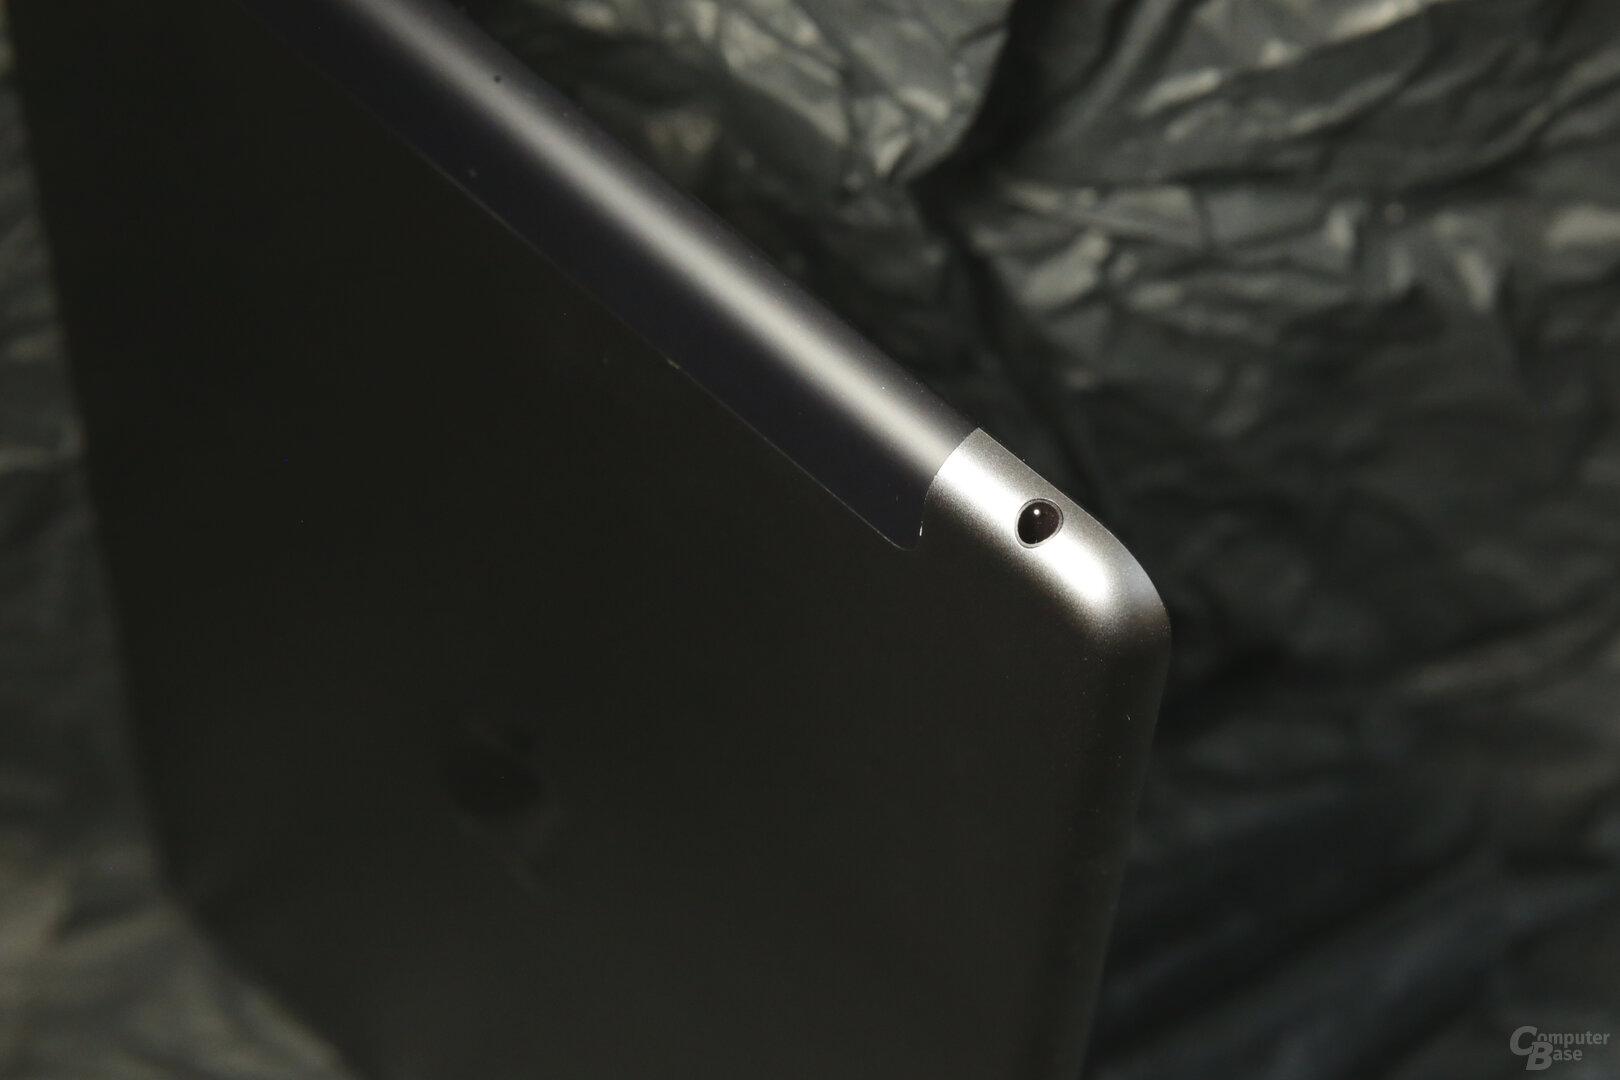 Letzes großes iPad mit 3,5-mm-Kopfhörerbuchse